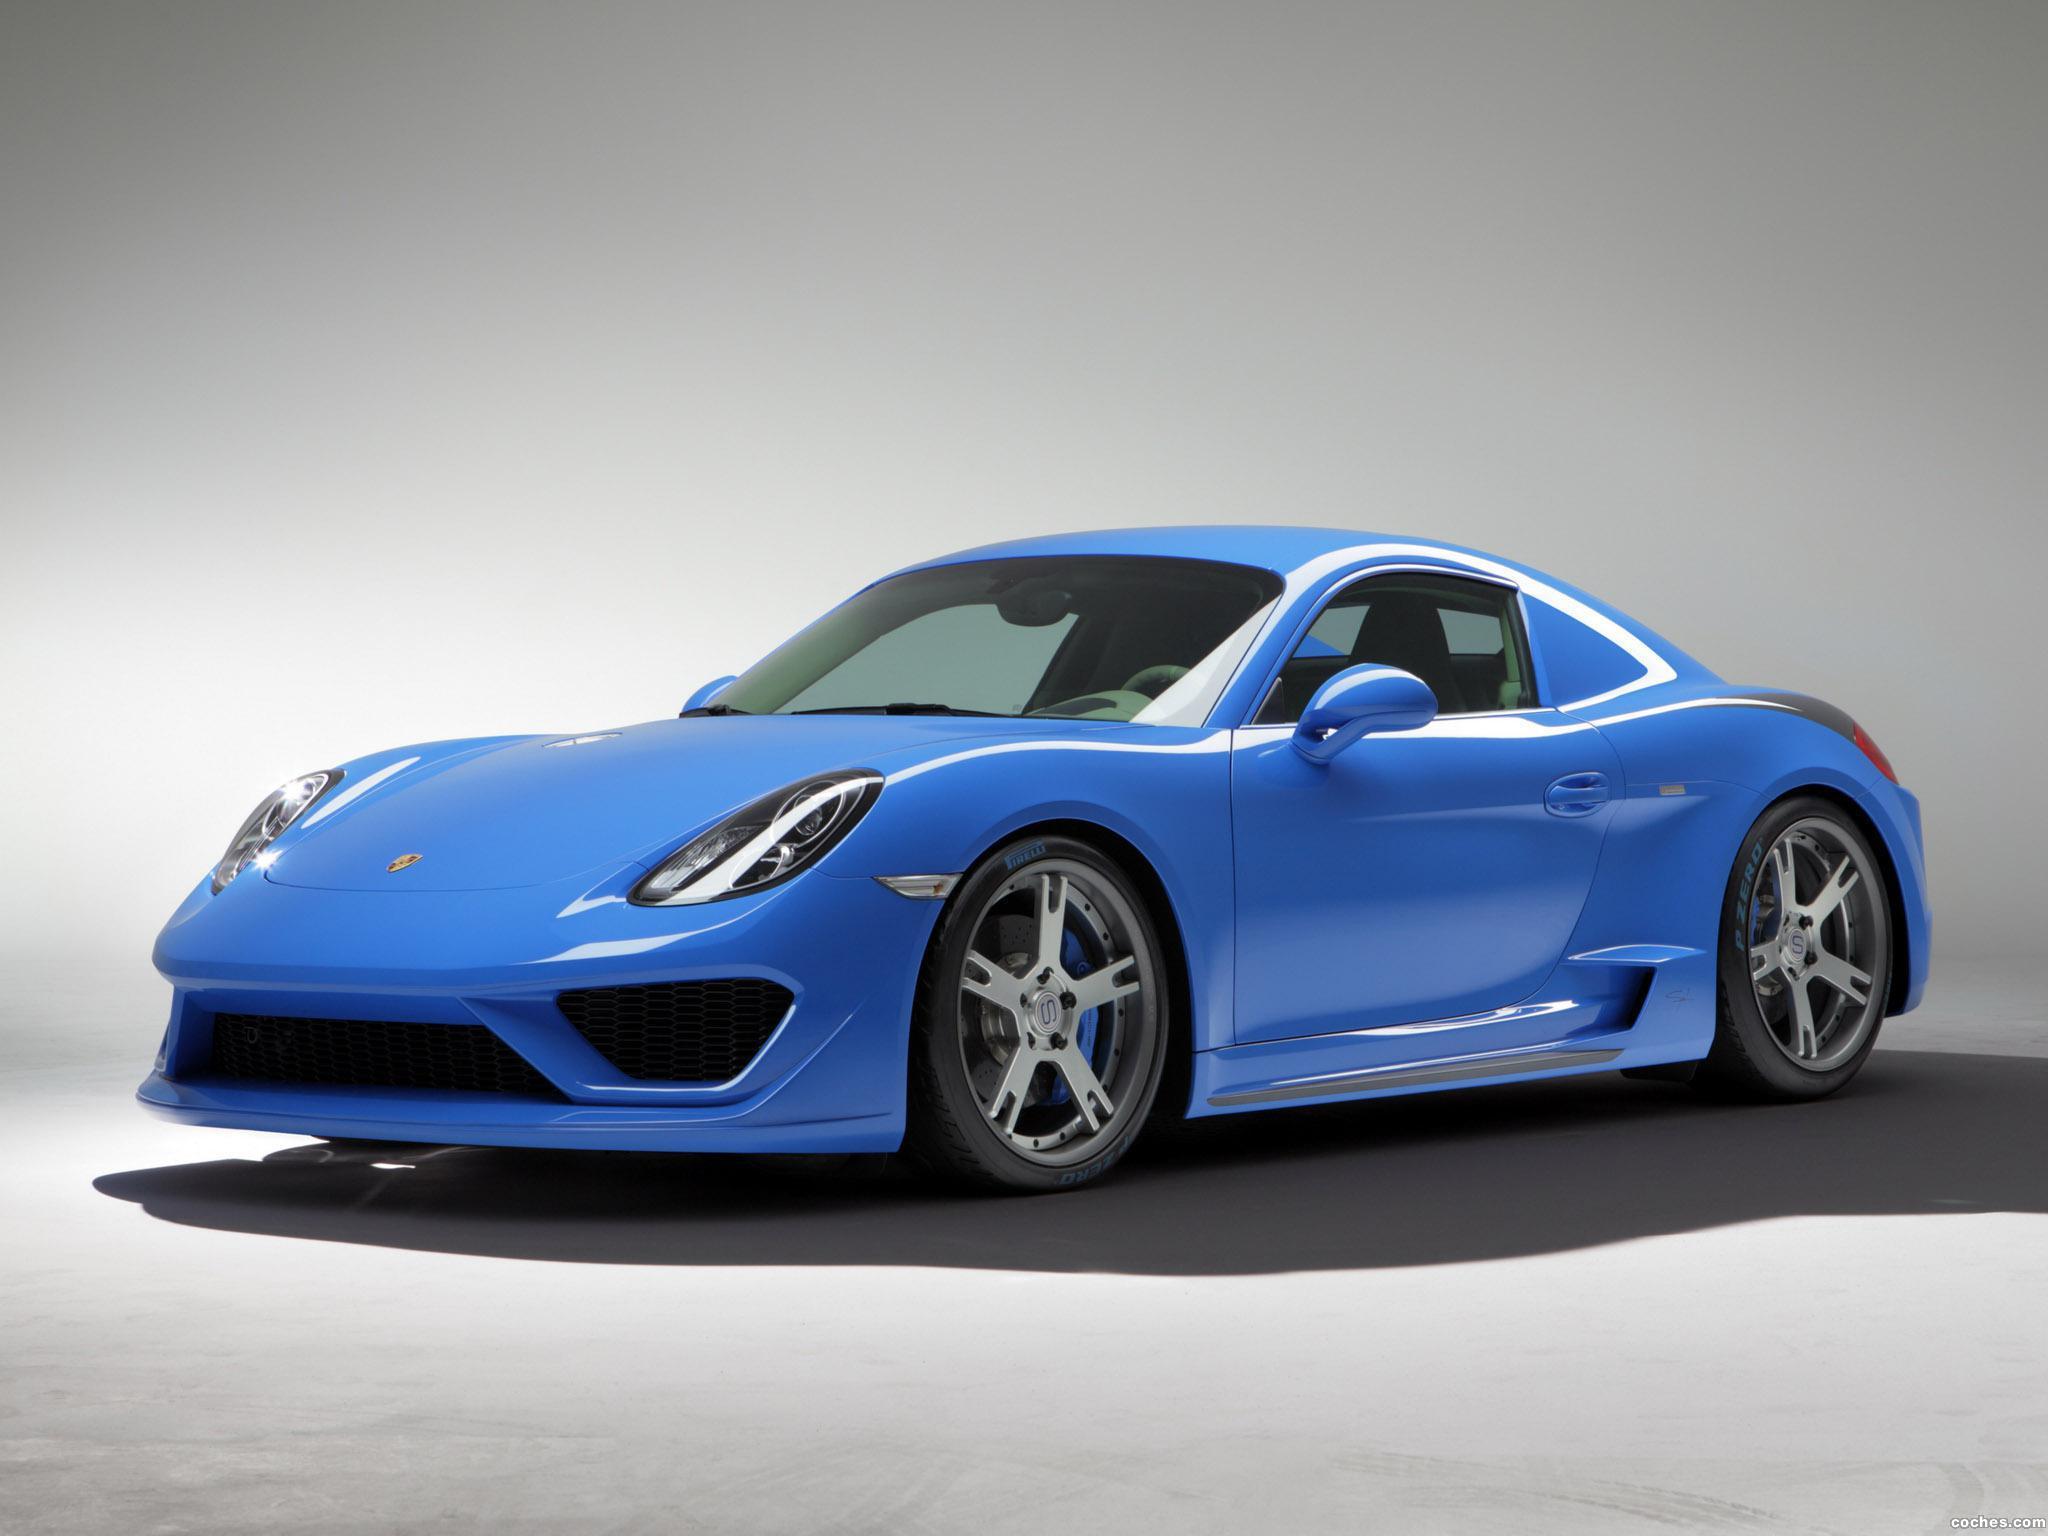 Foto 2 de Porsche Studiotorino Cayman Moncenisio 2014